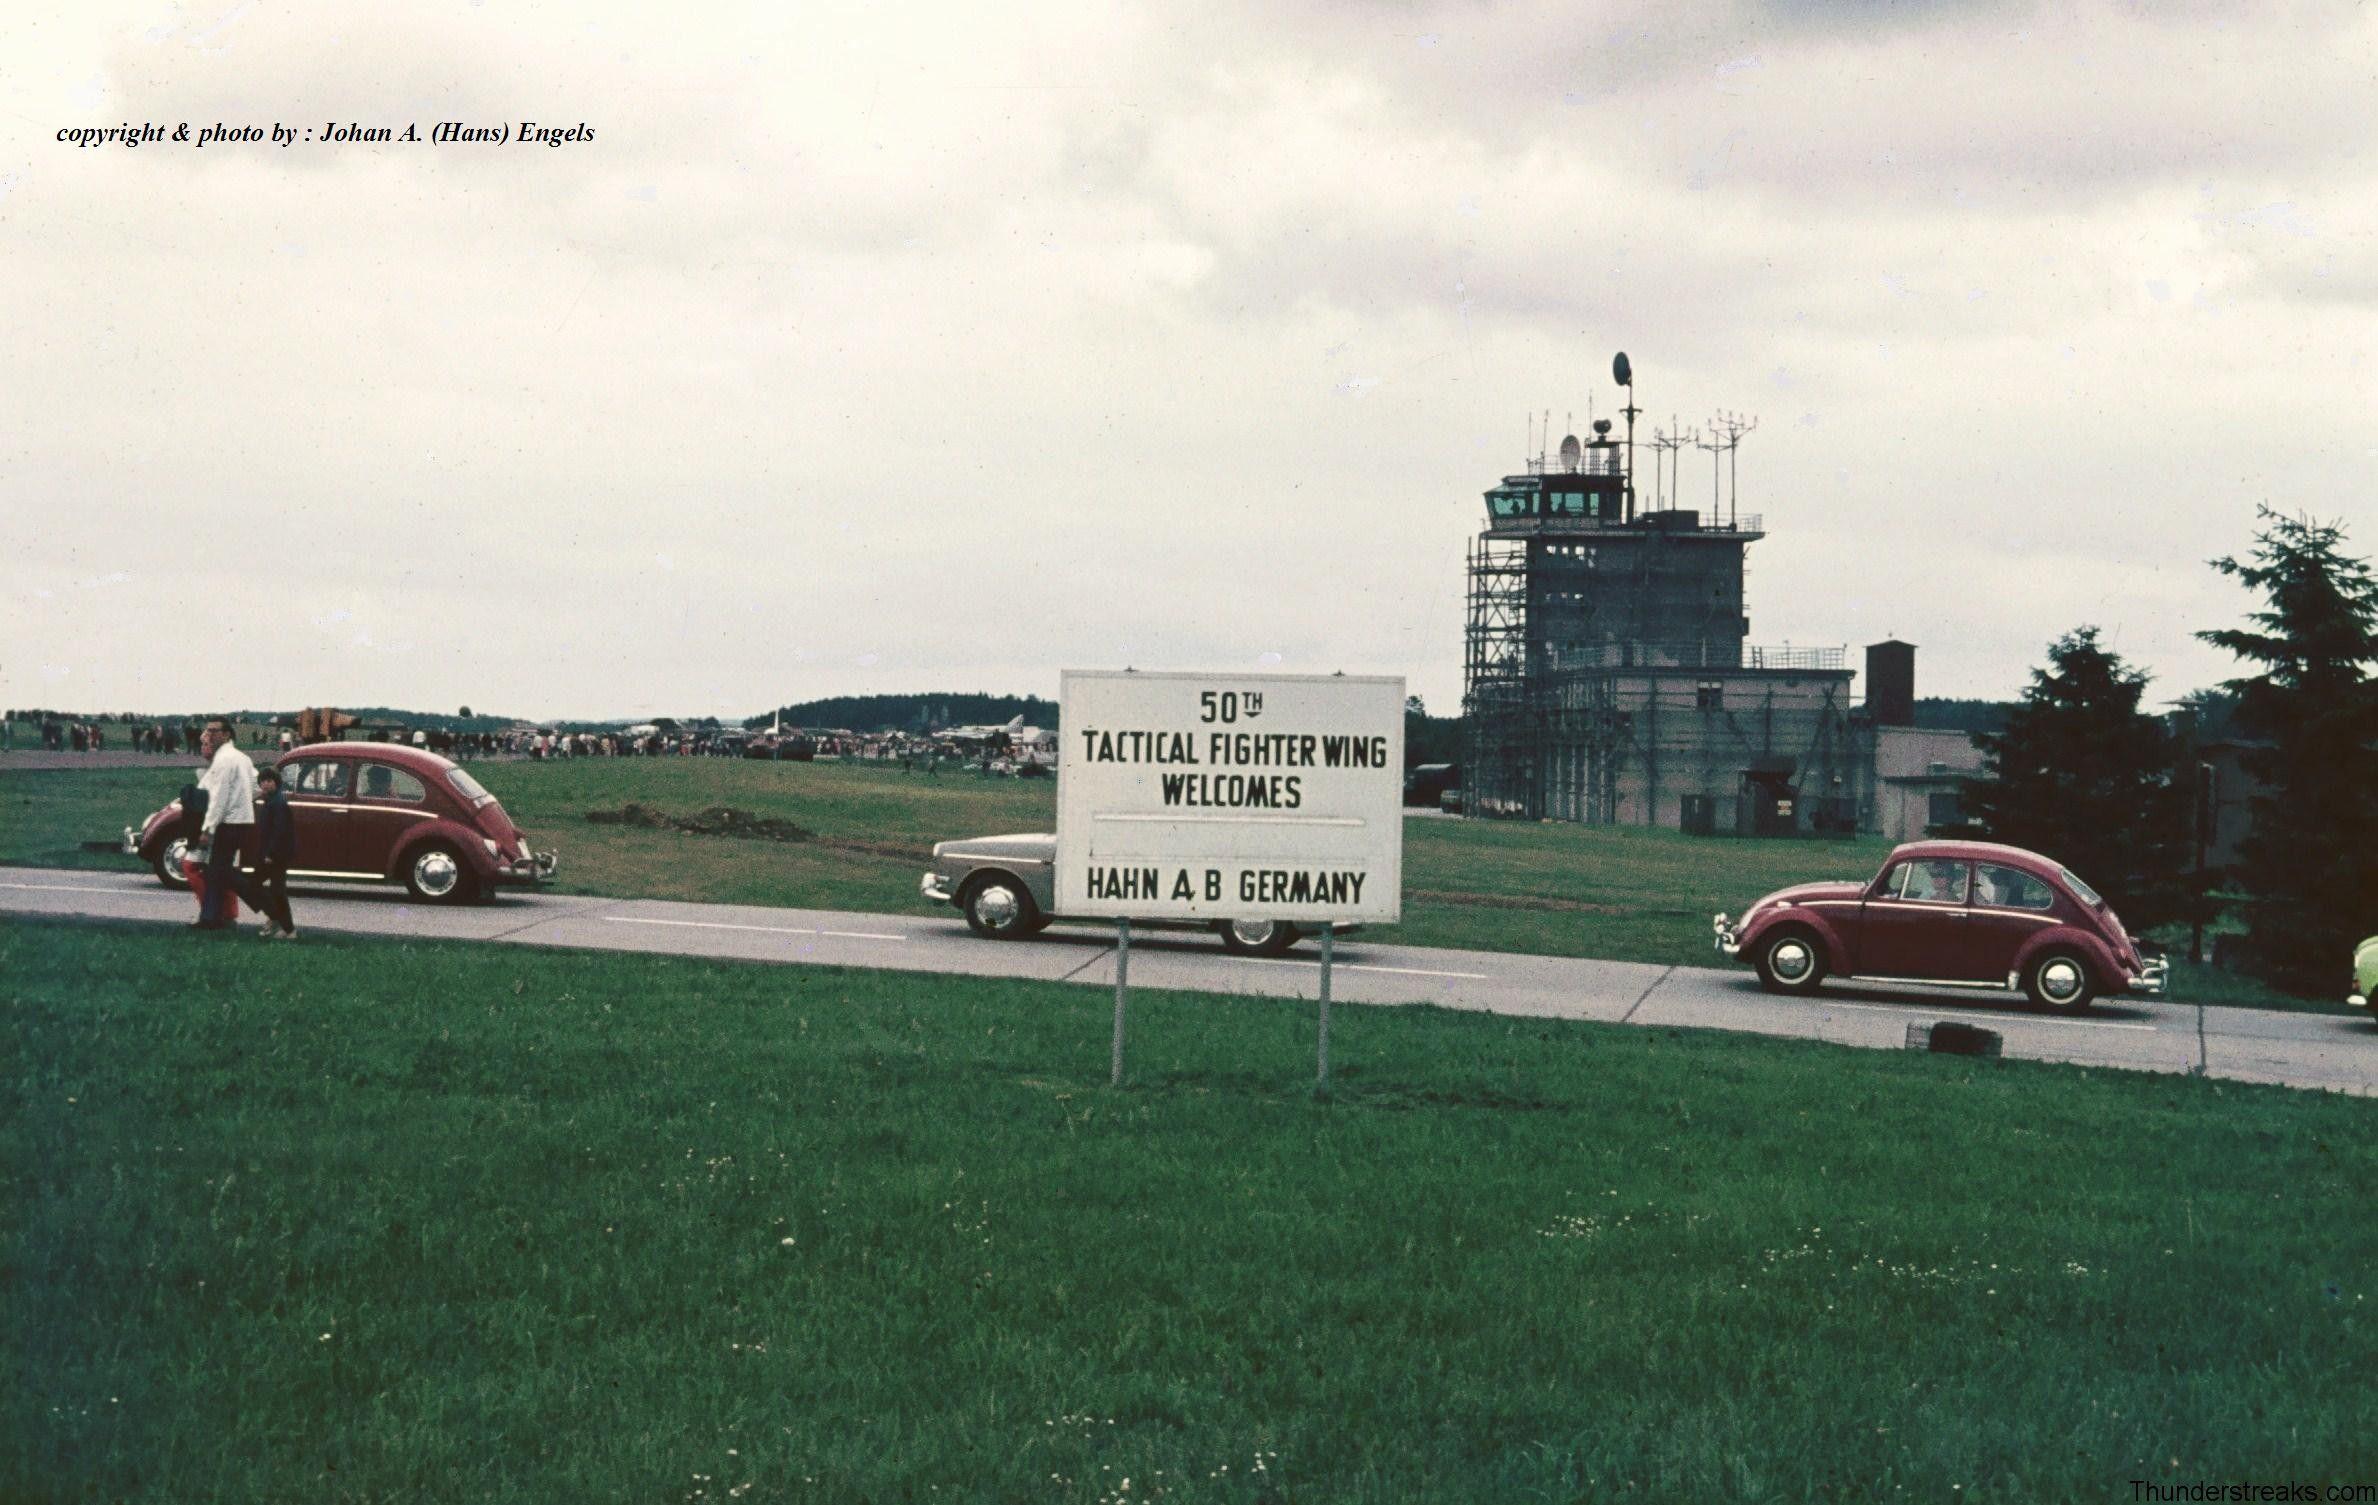 [Image: 1971-Hahn-Air-Base-Germany-10-6-1971-J.A.Engels.jpg]